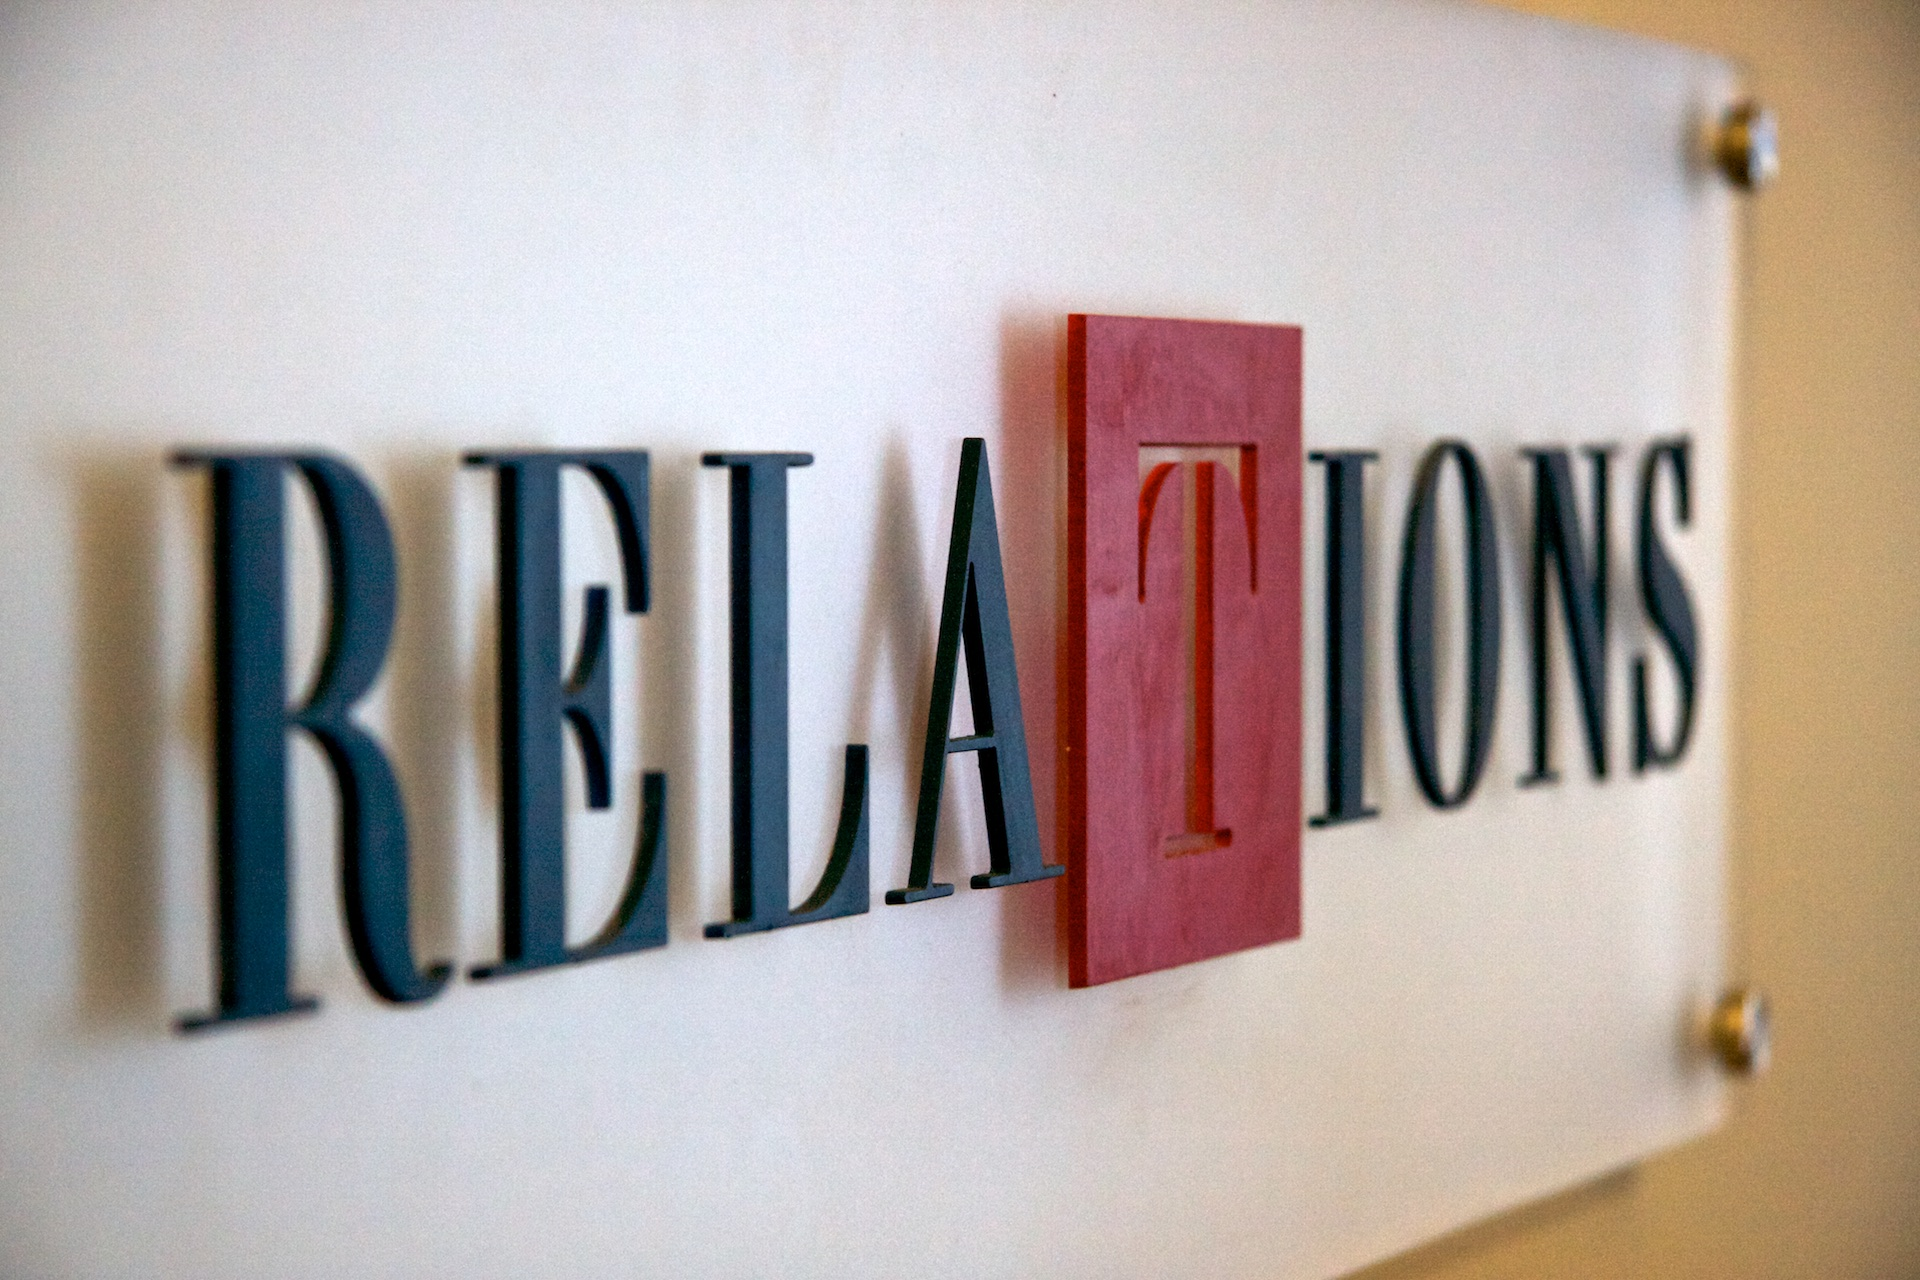 LT Public Relations